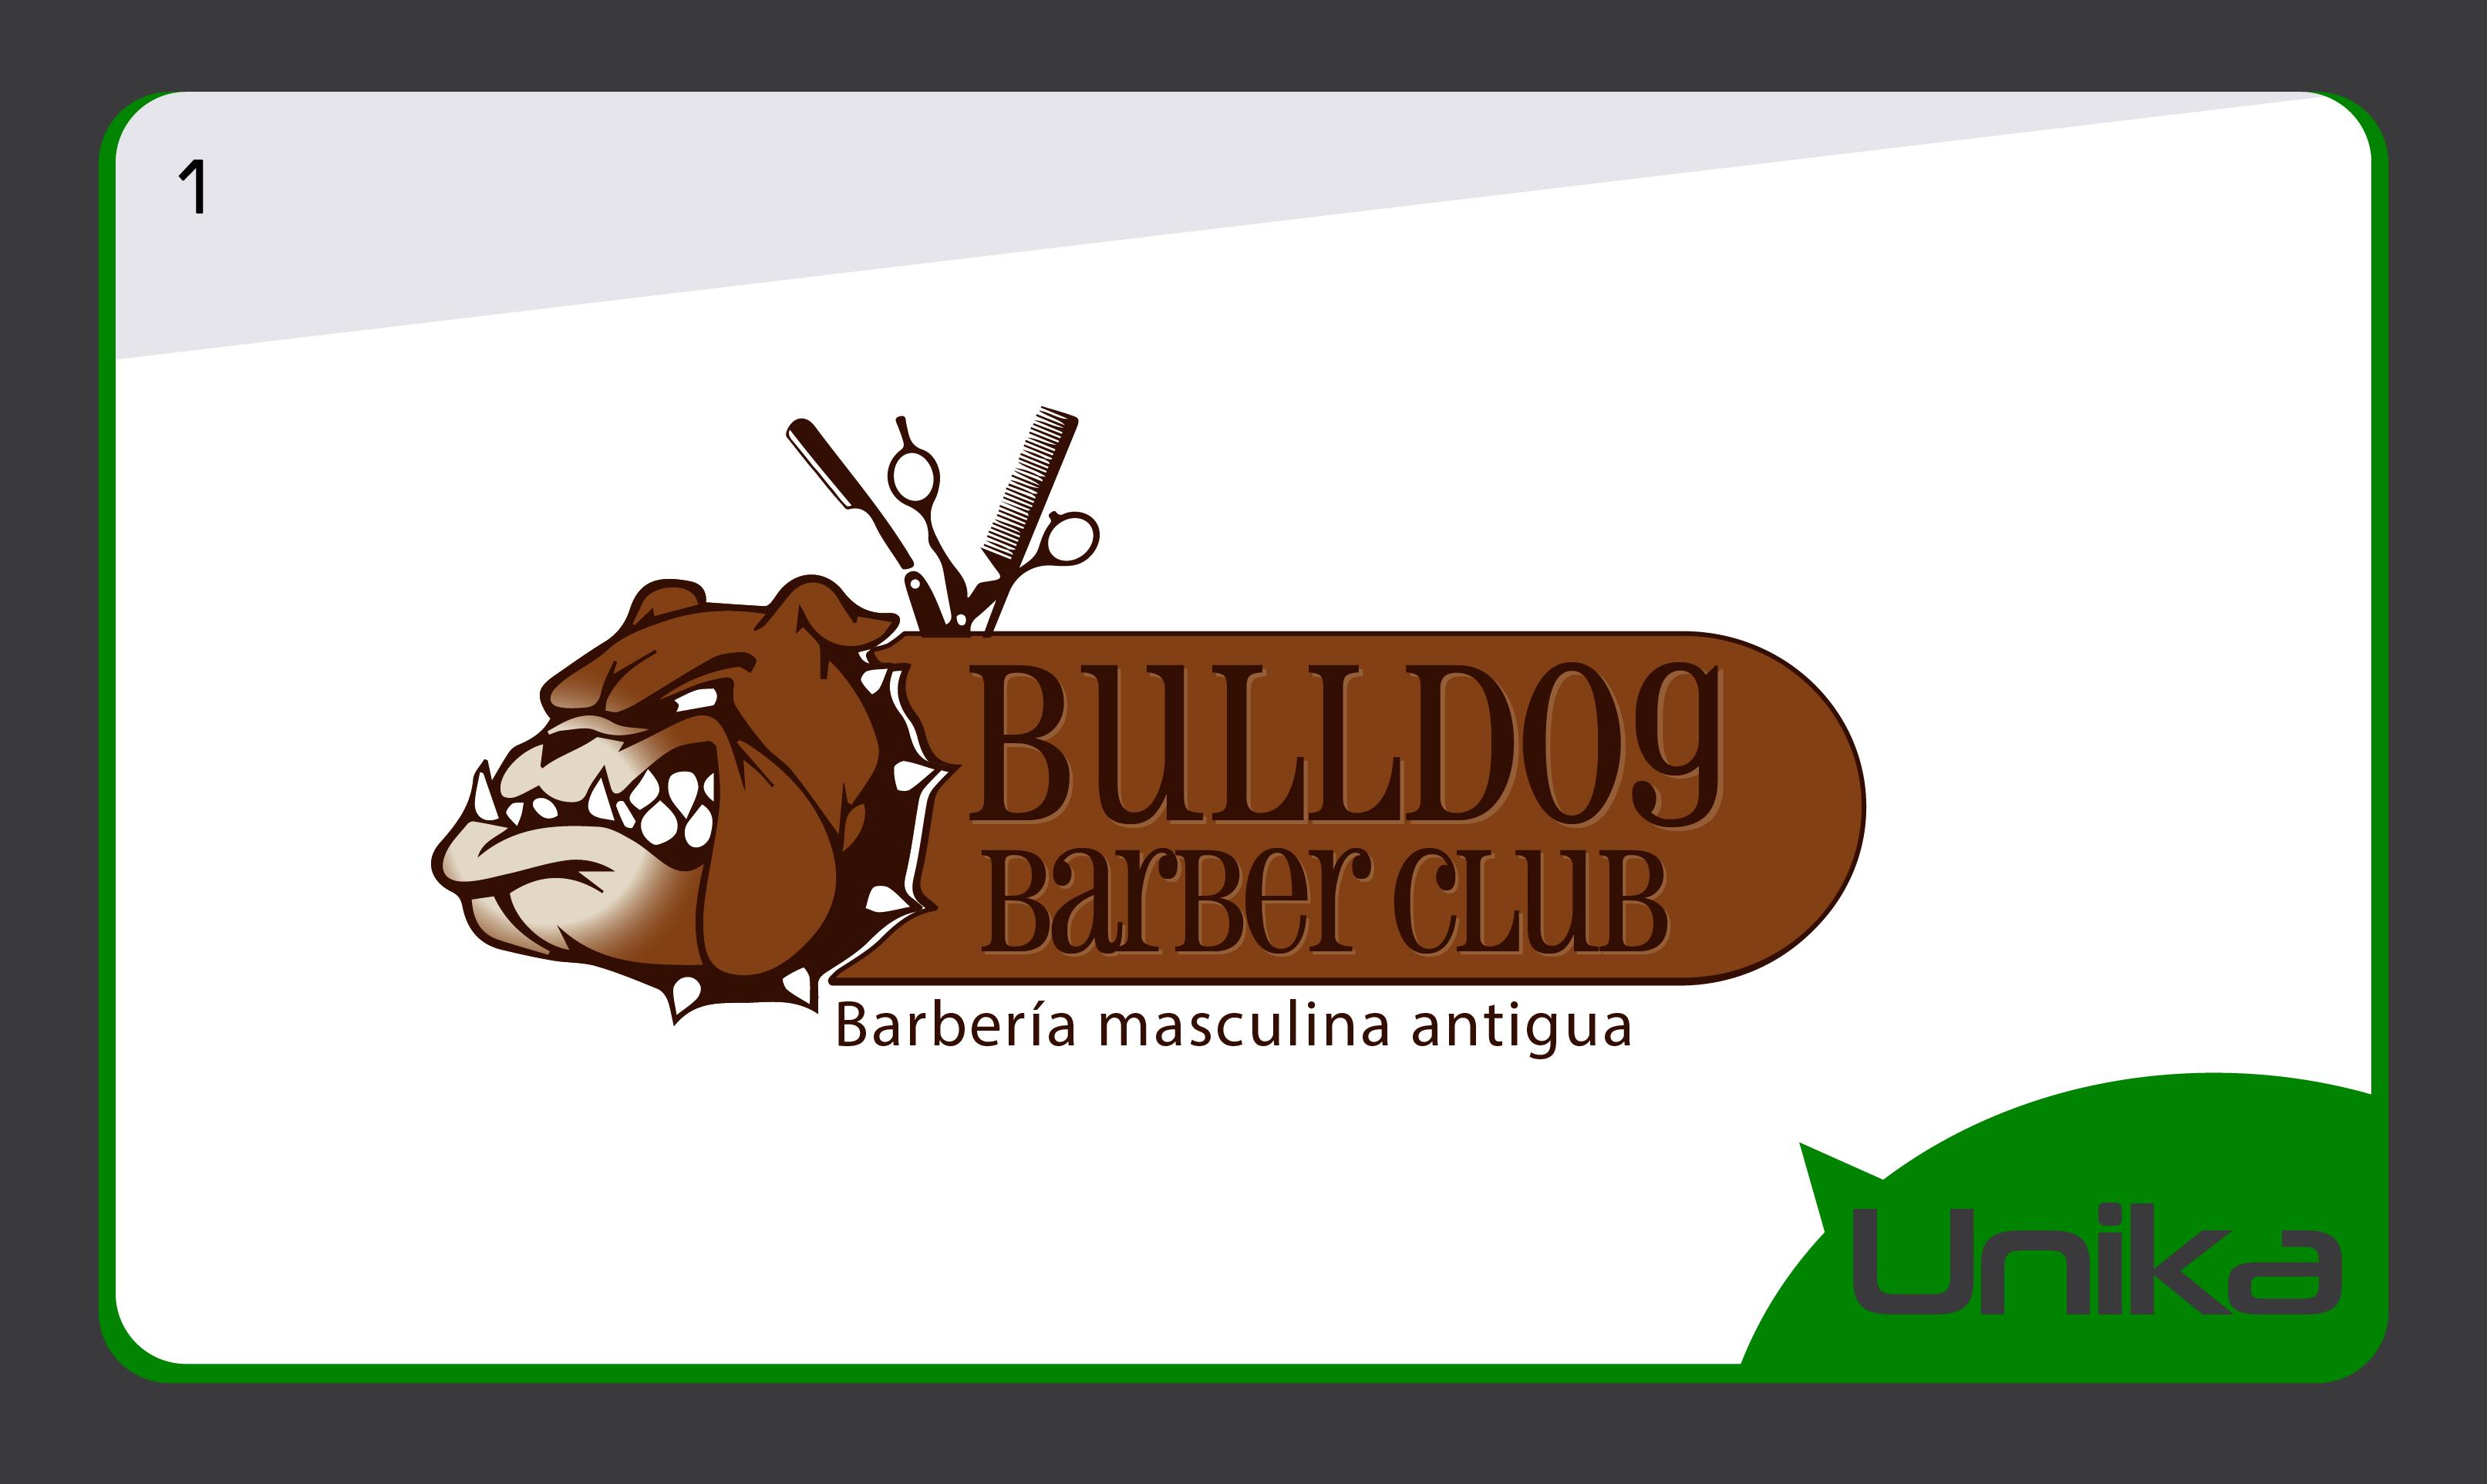 Bulldog barber club